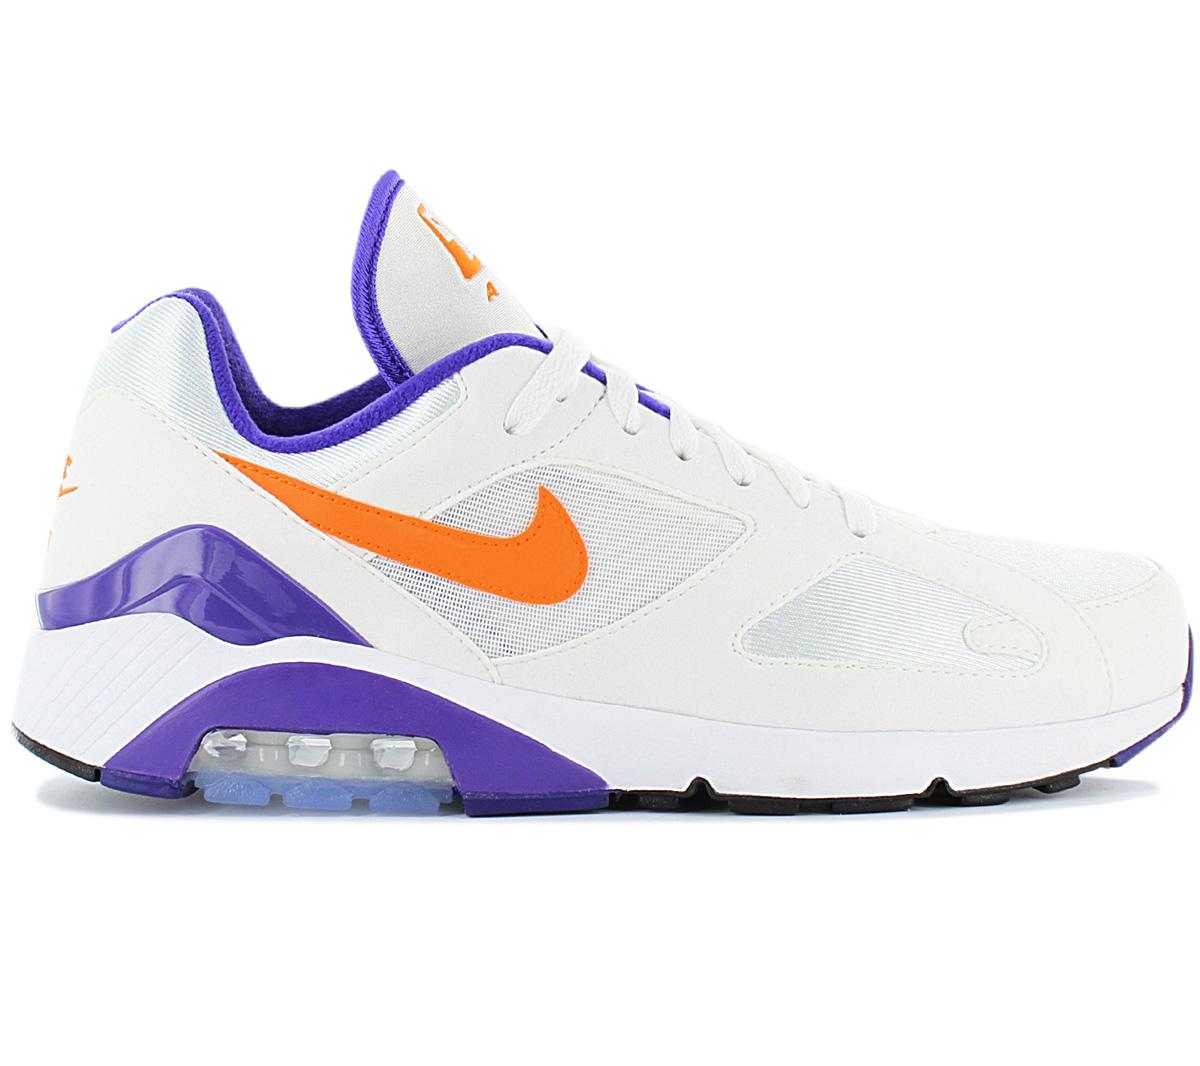 Nike Air Max Men's Shoes   Groupon Goods